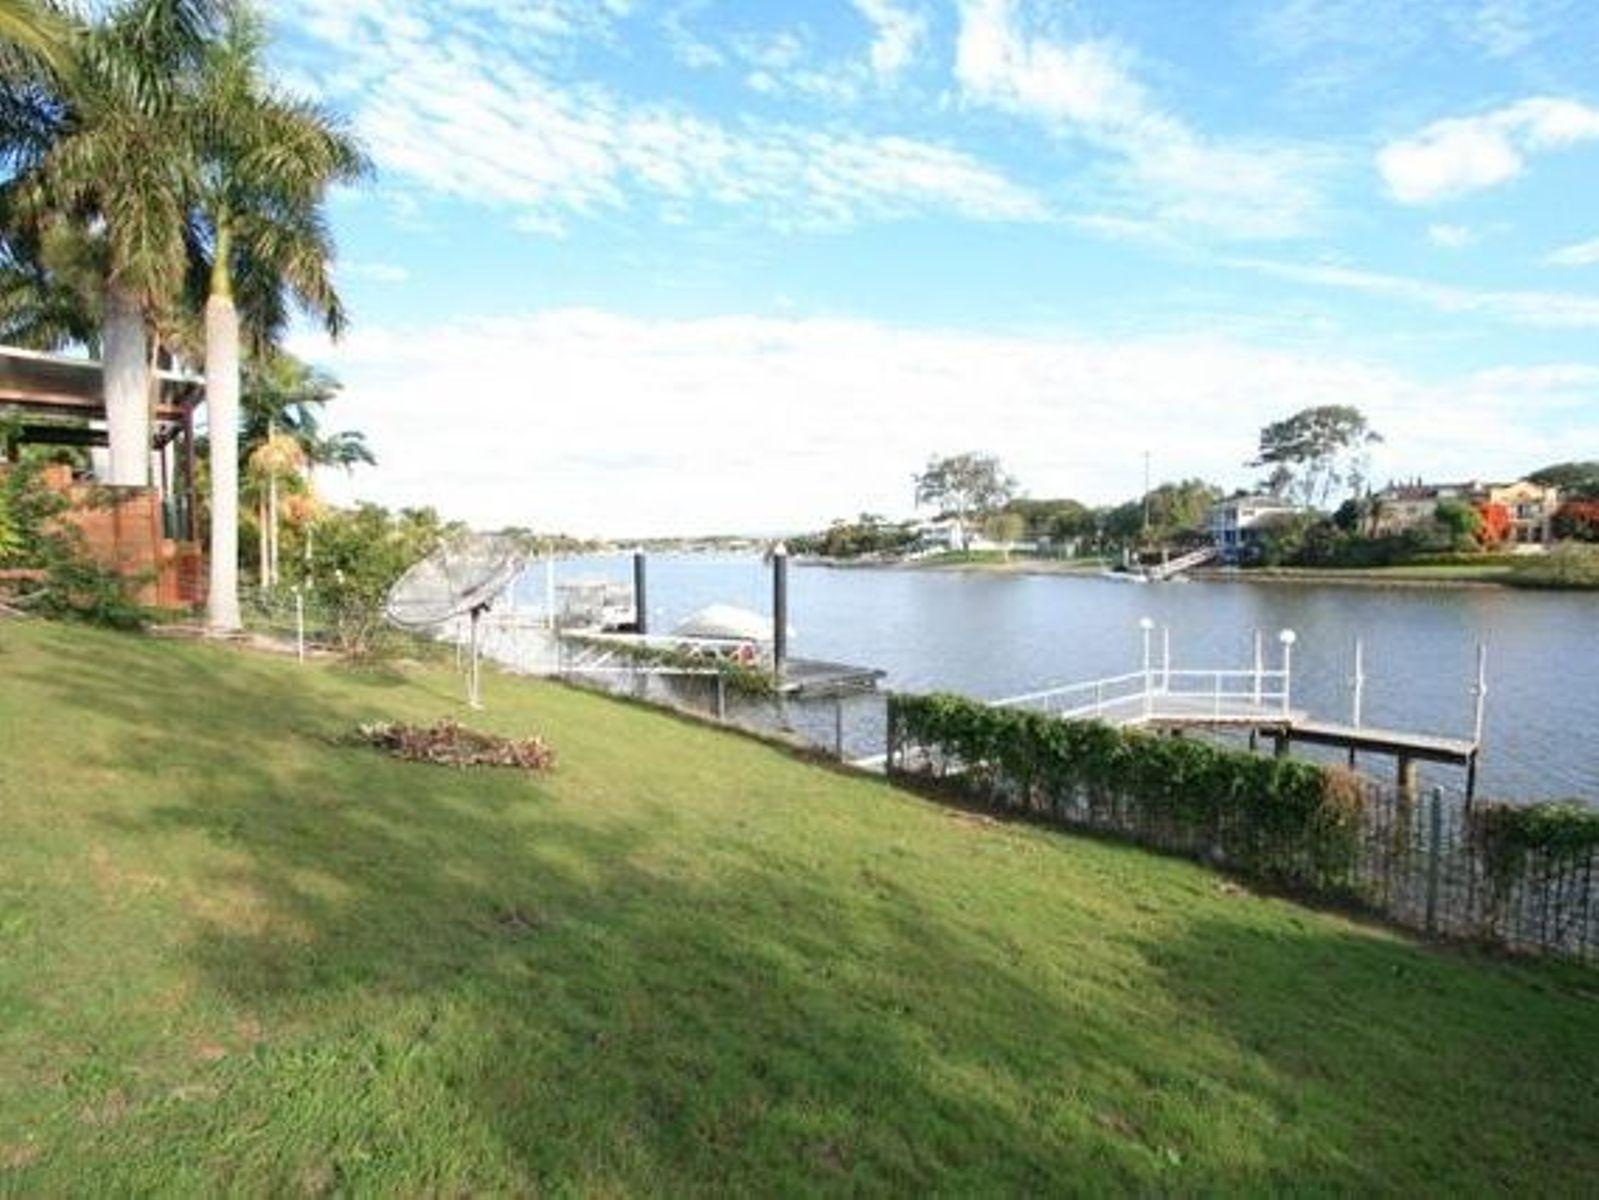 12 Cabana Boulevard, Benowa Waters, QLD 4217